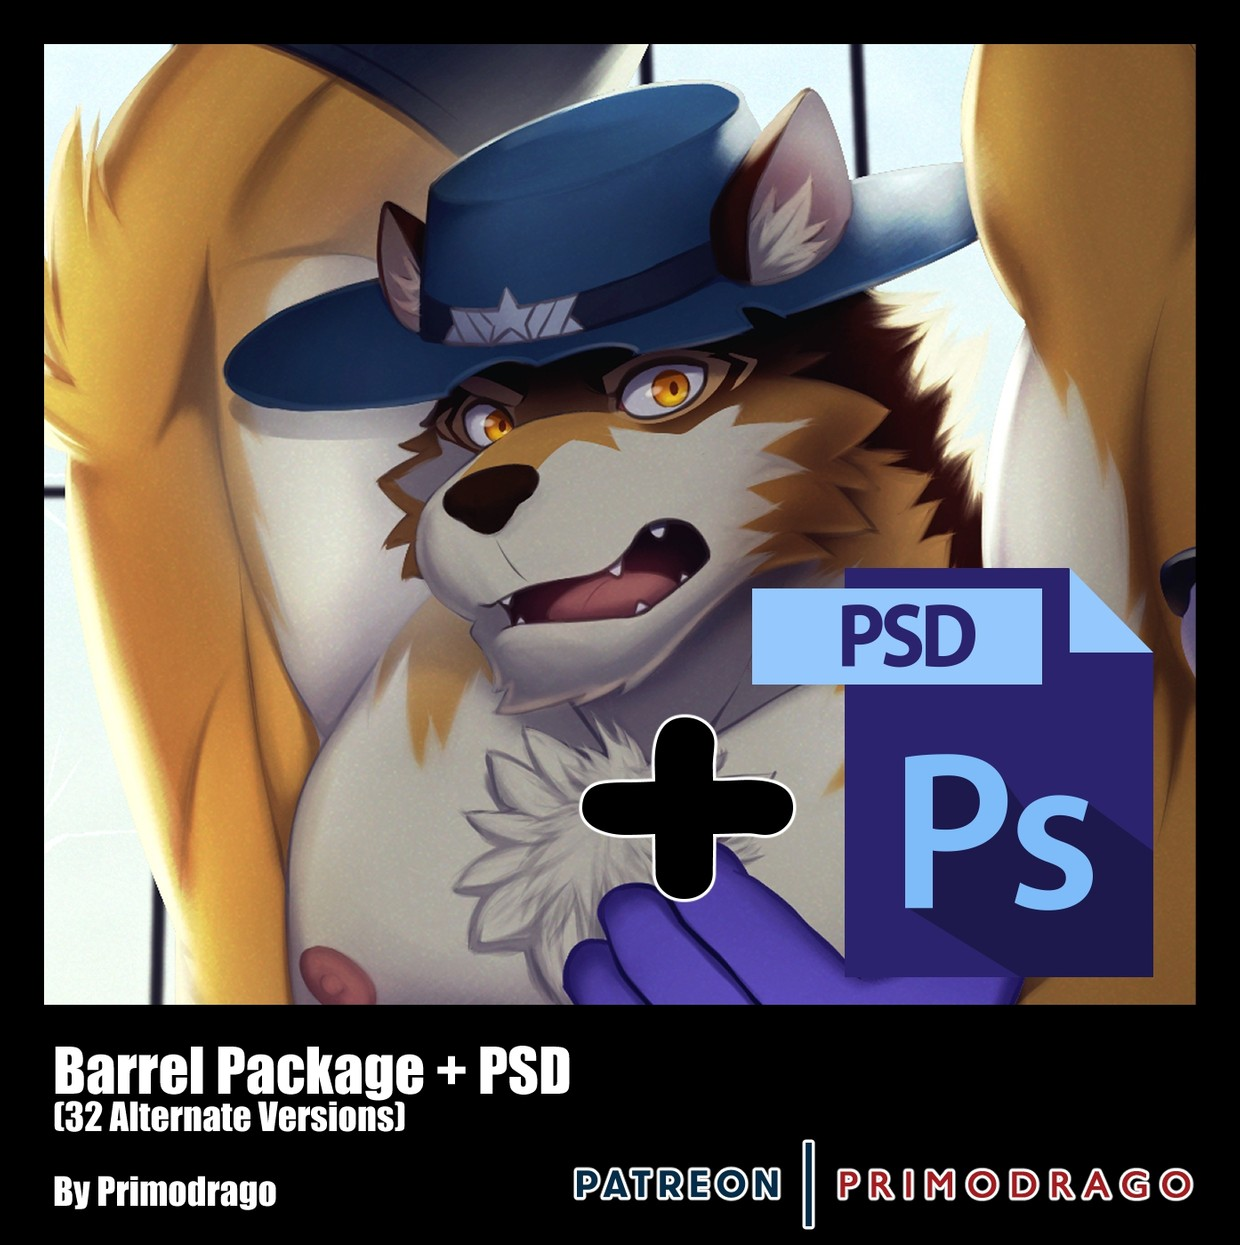 Barrel Artpack + PSD File